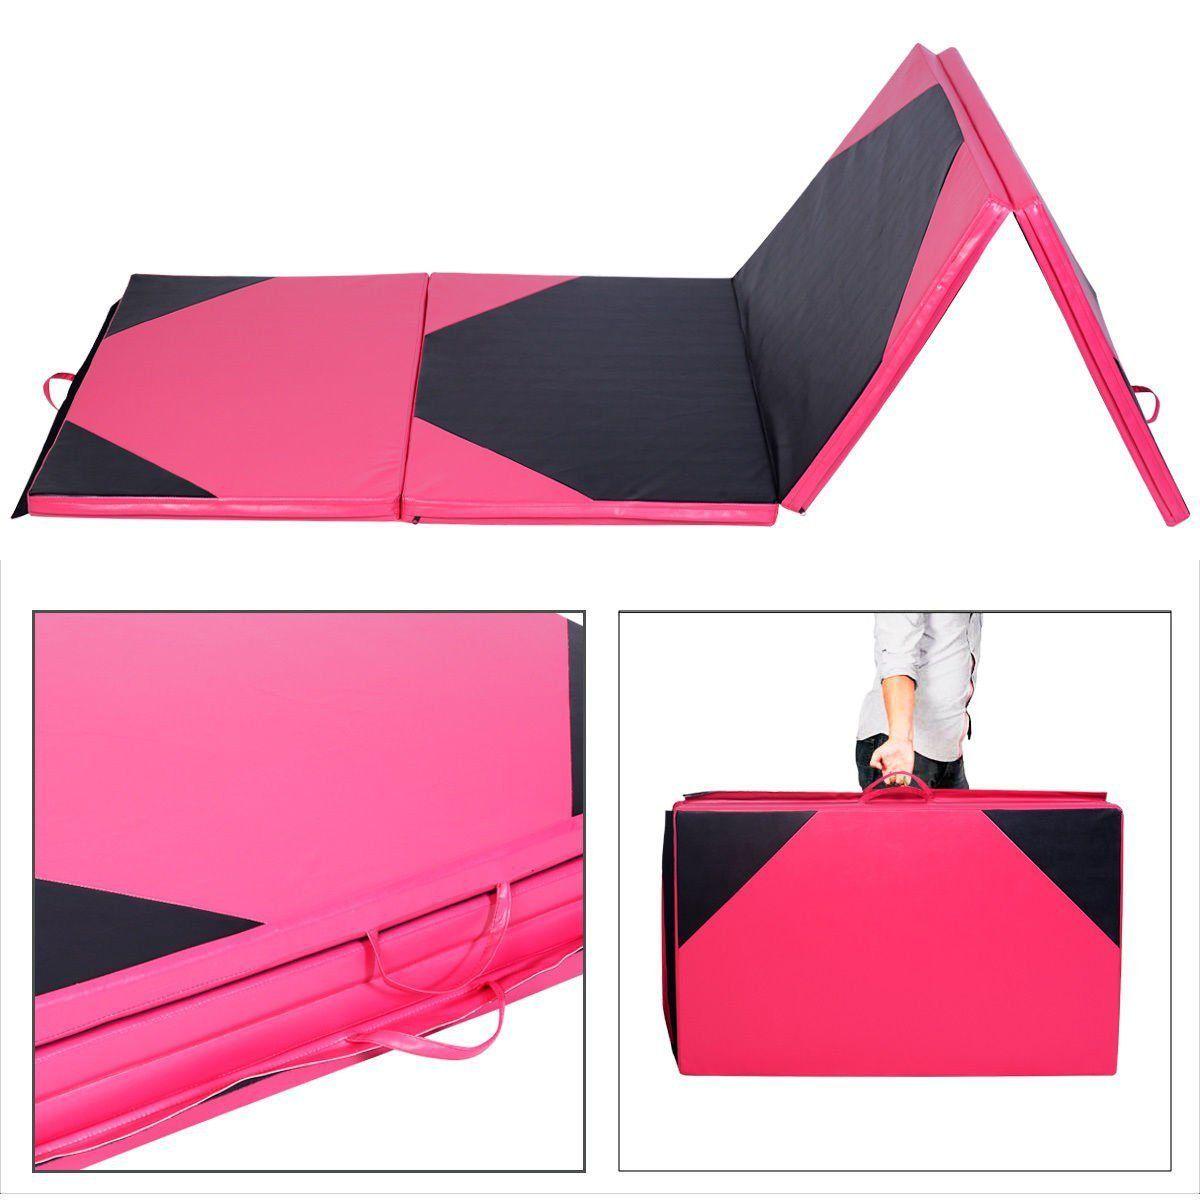 Yoga Mats 4 X10 X2 Thick Folding Panel Gymnastics Mat Gym